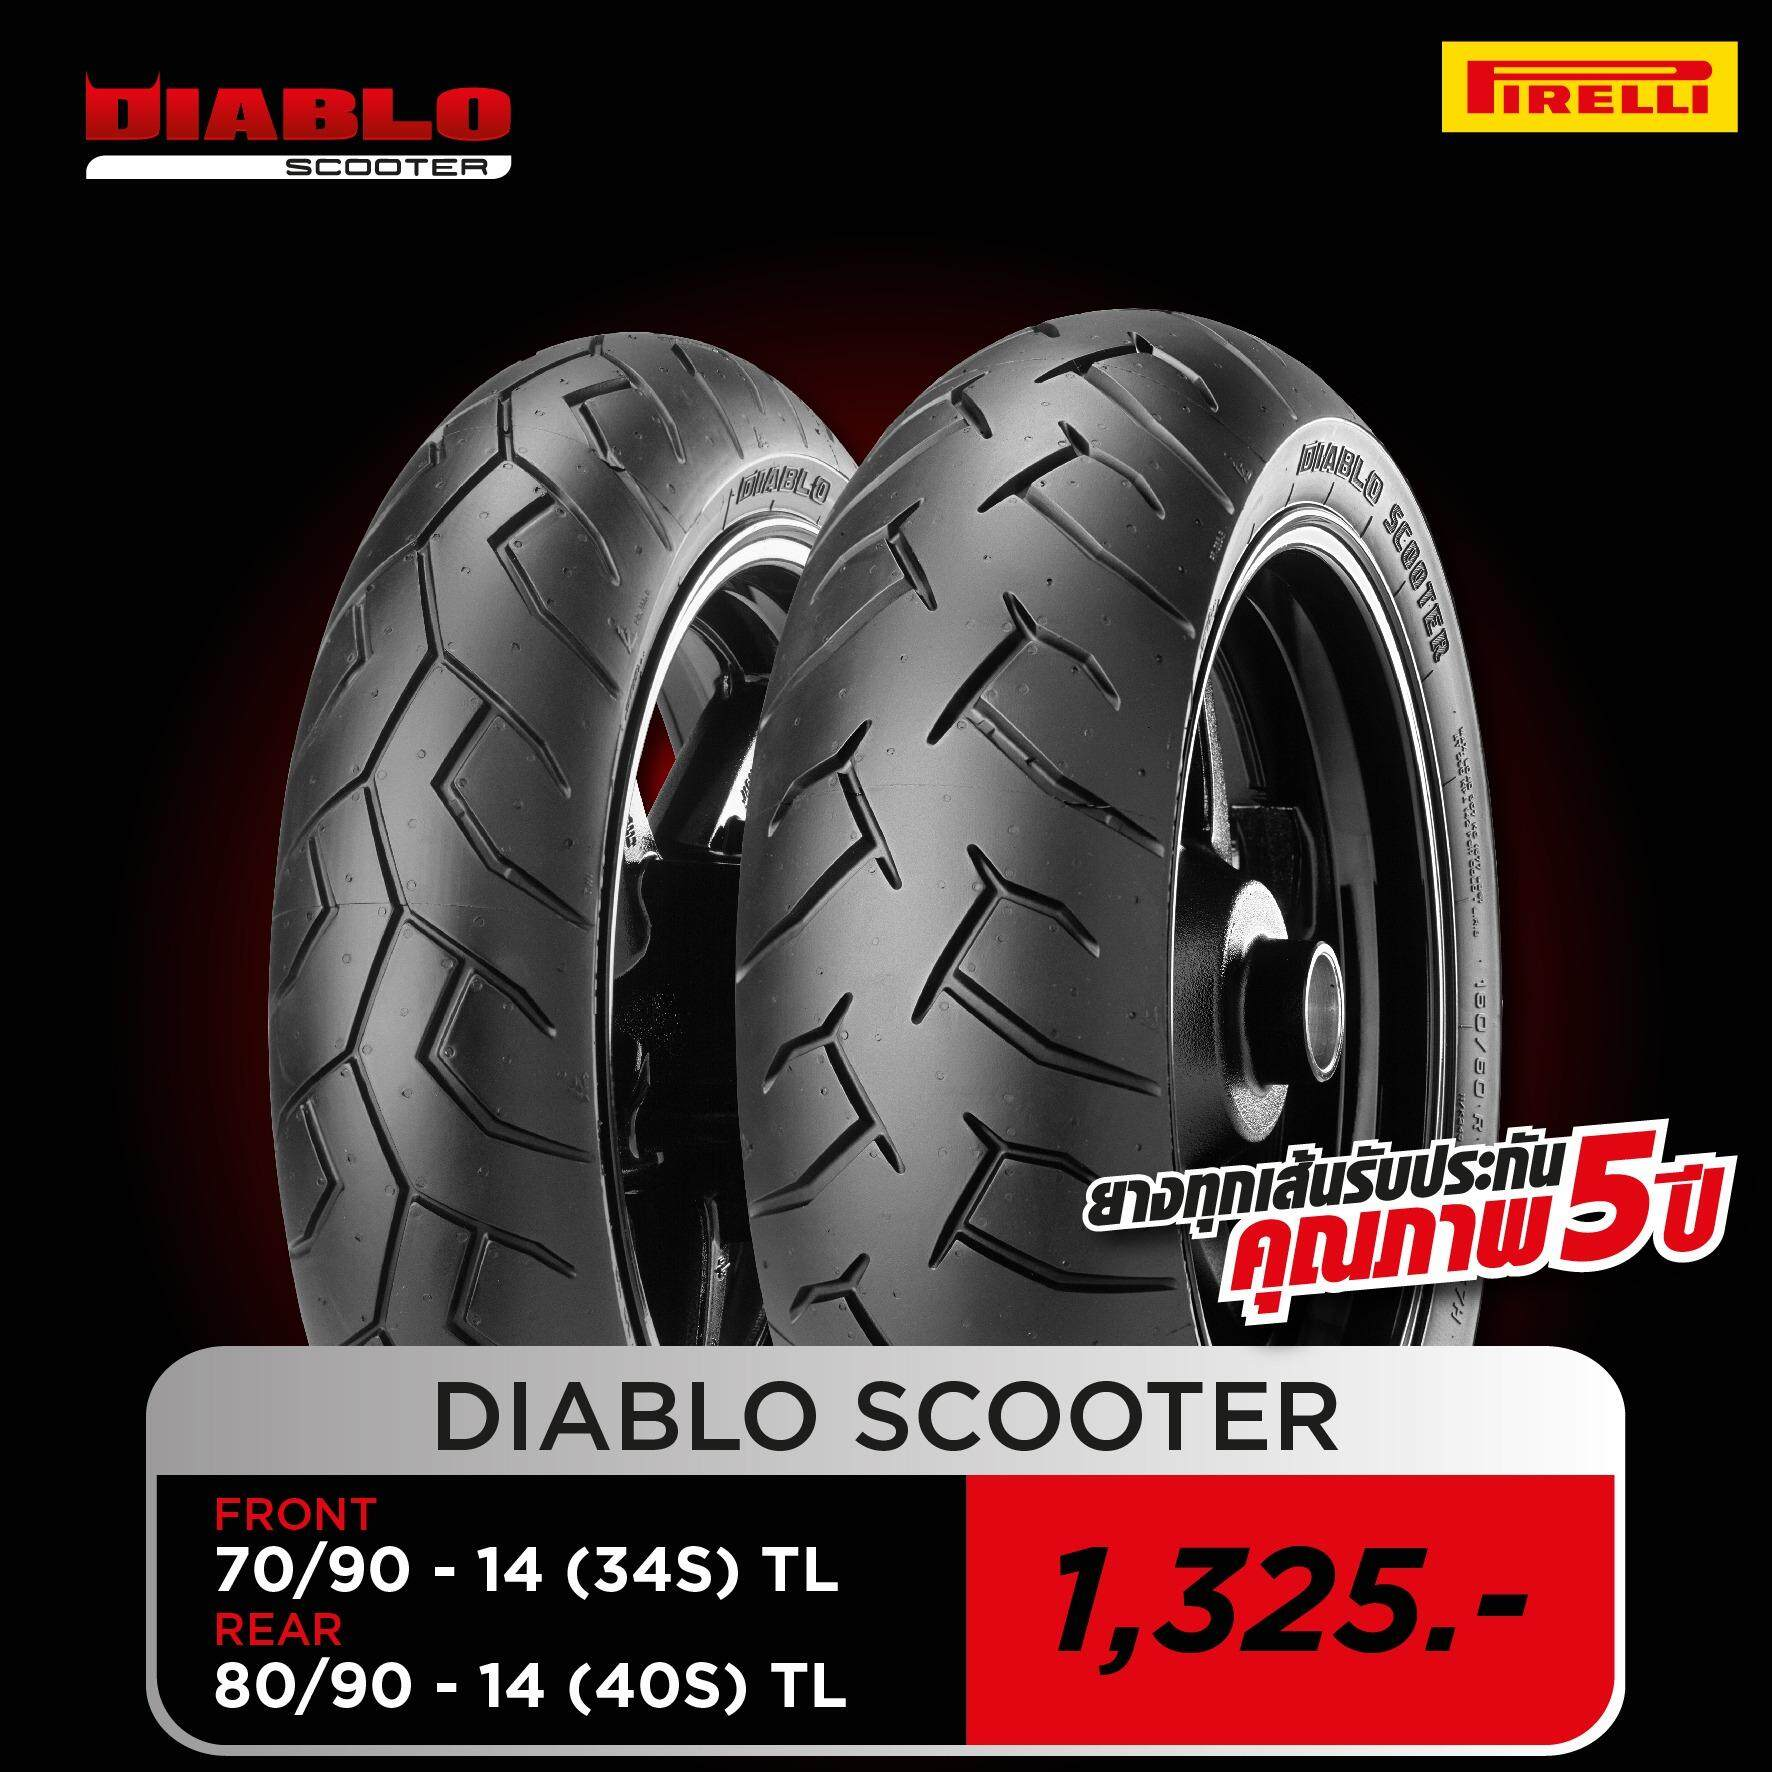 Diablo Scooter 70 90 14 80 90 14 ใน กรุงเทพมหานคร